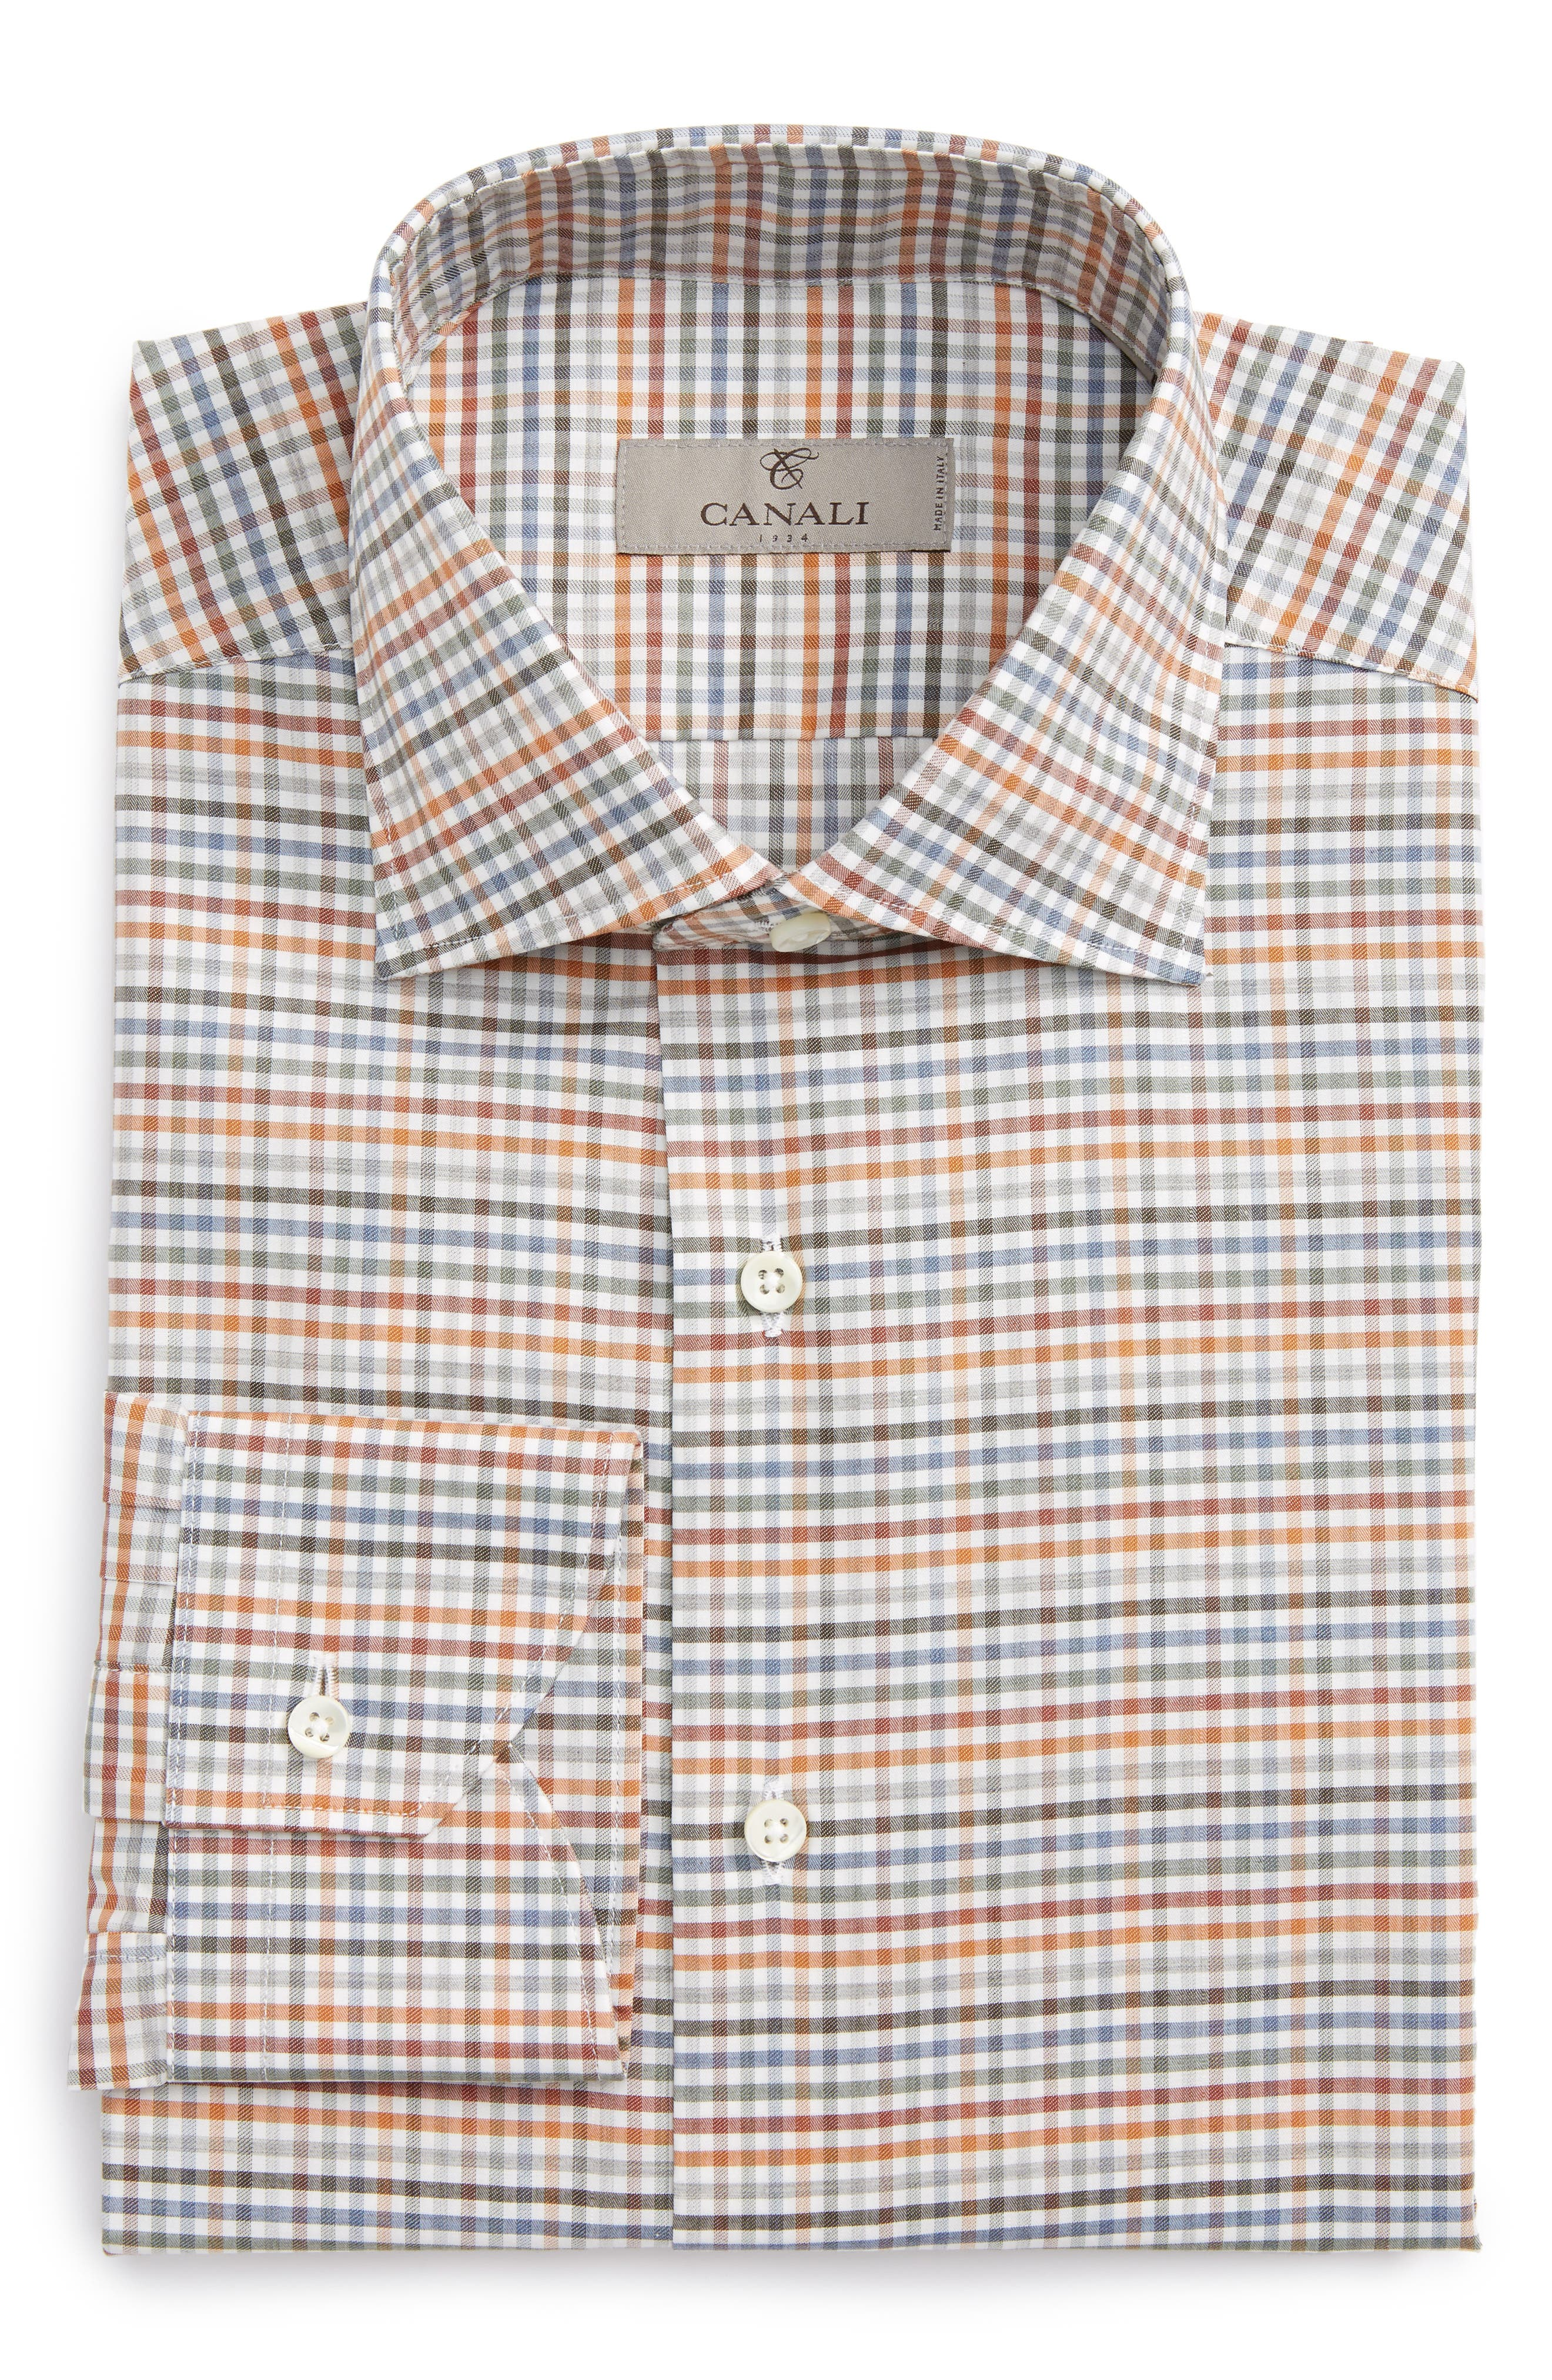 Regular Fit Check Dress Shirt,                             Main thumbnail 1, color,                             Orange/ Green